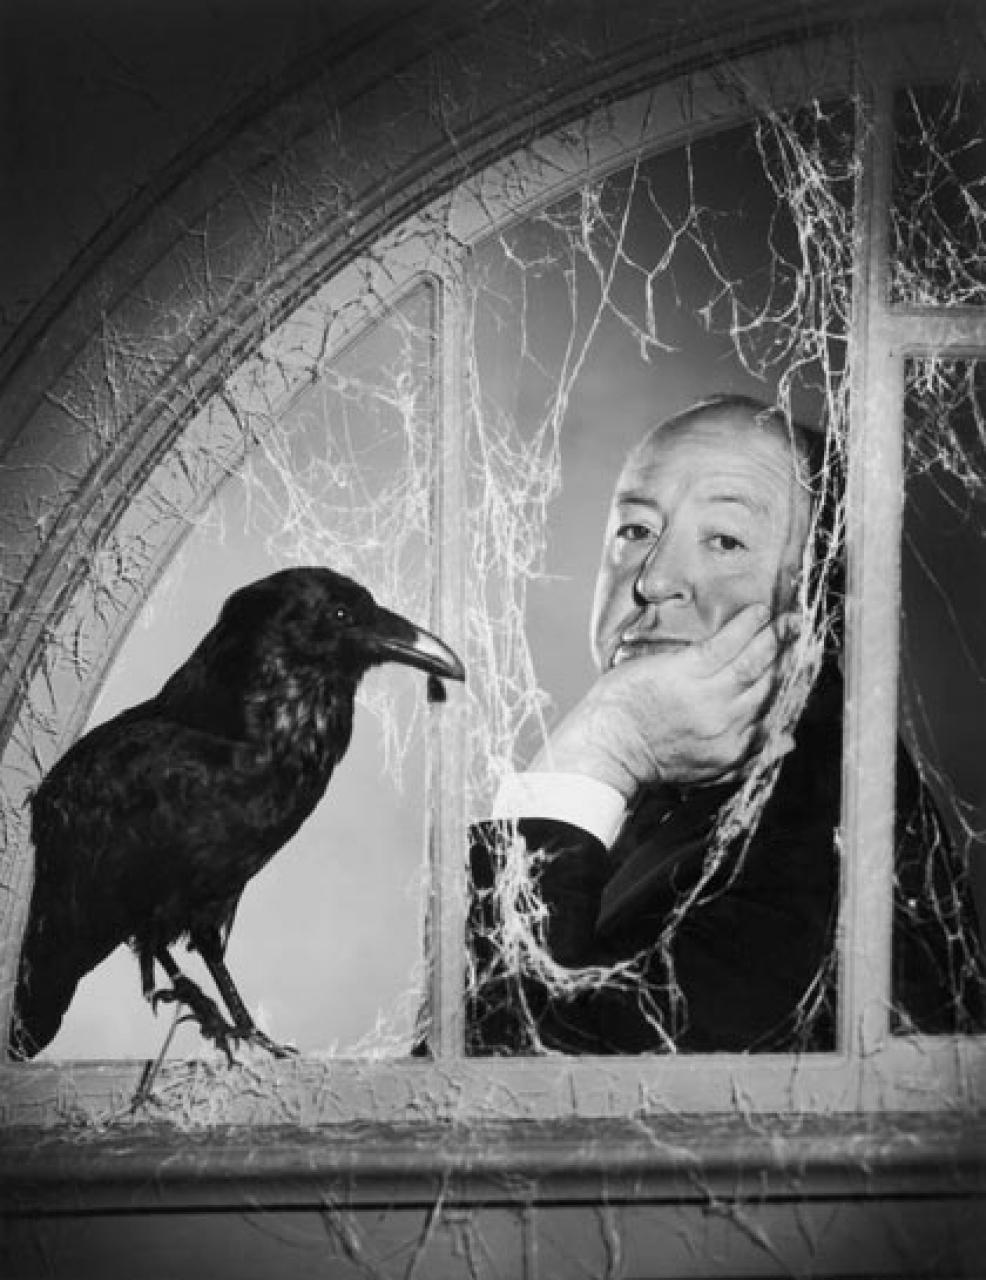 Alfred Hitchcock - L'uomo che visse due volte (mp3 - 111kbps)